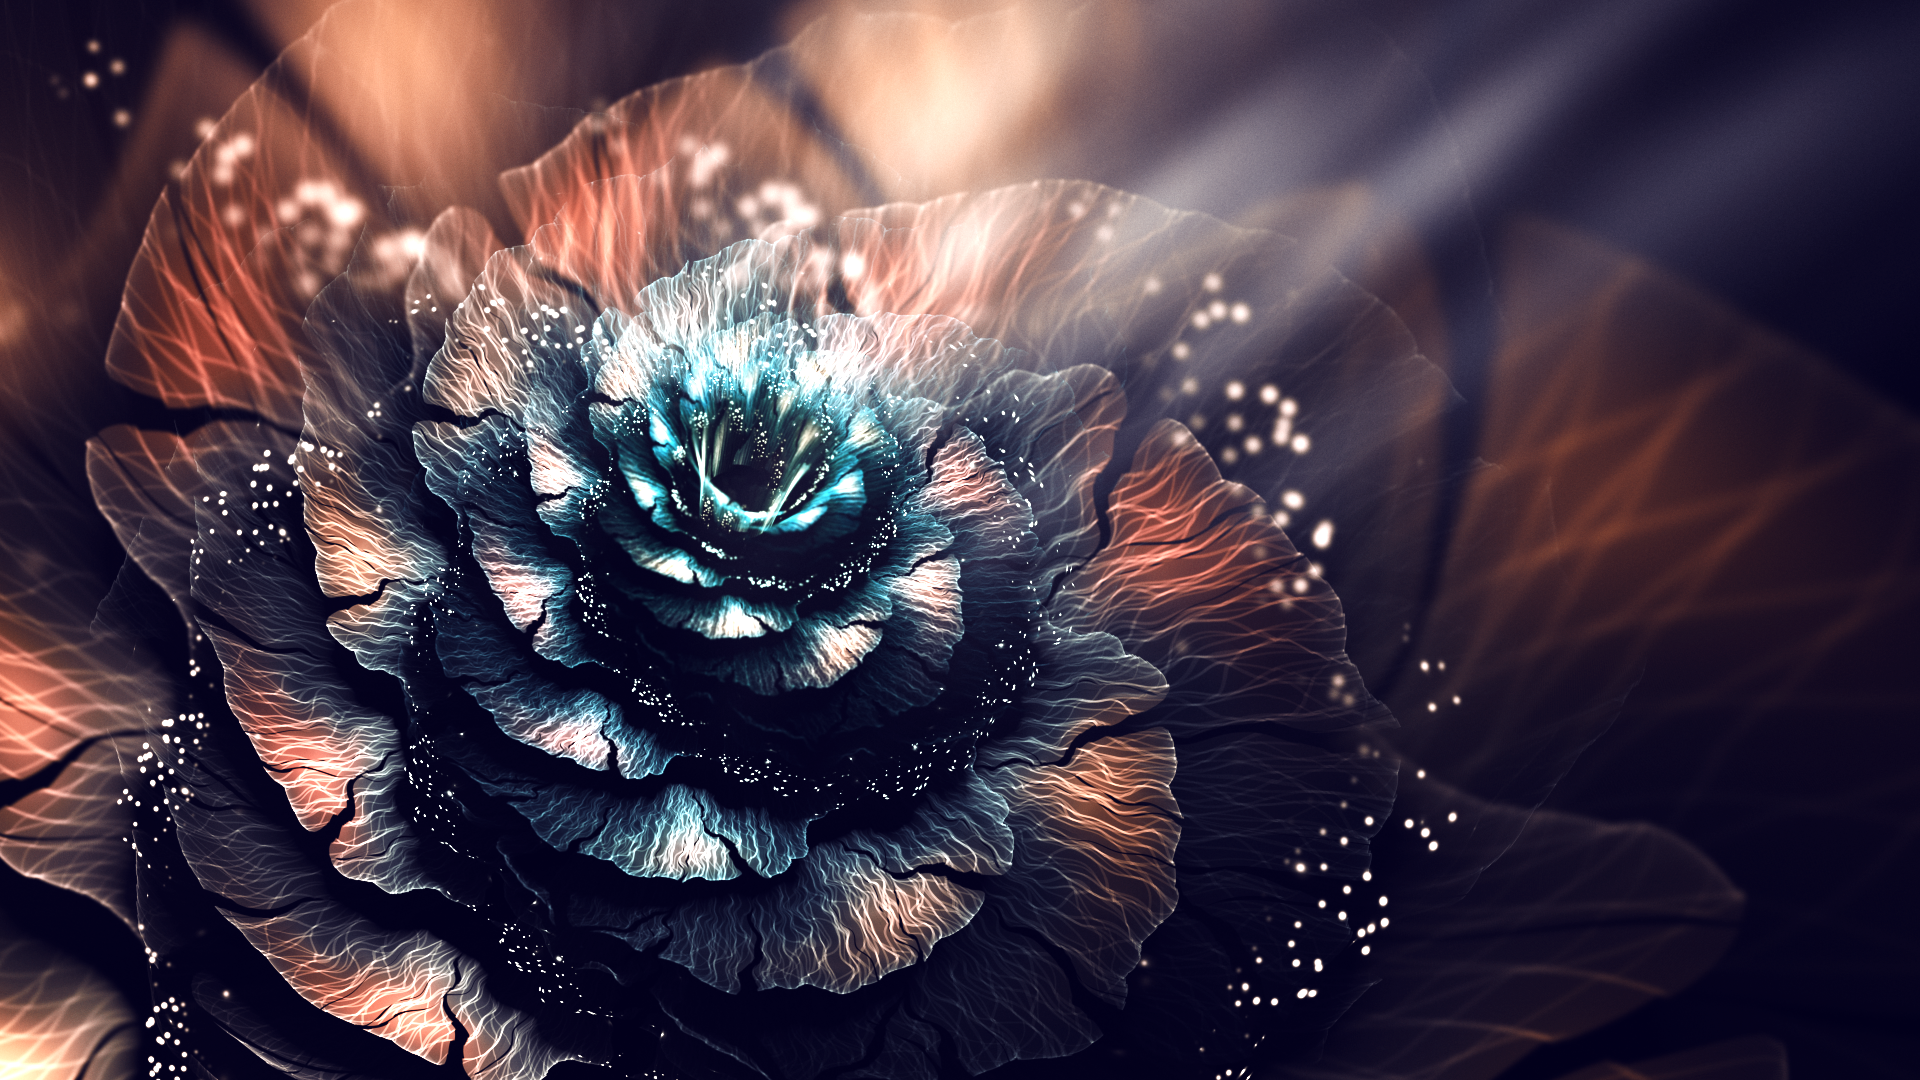 General 1920x1080 3D abstract fractal fractal flowers digital art